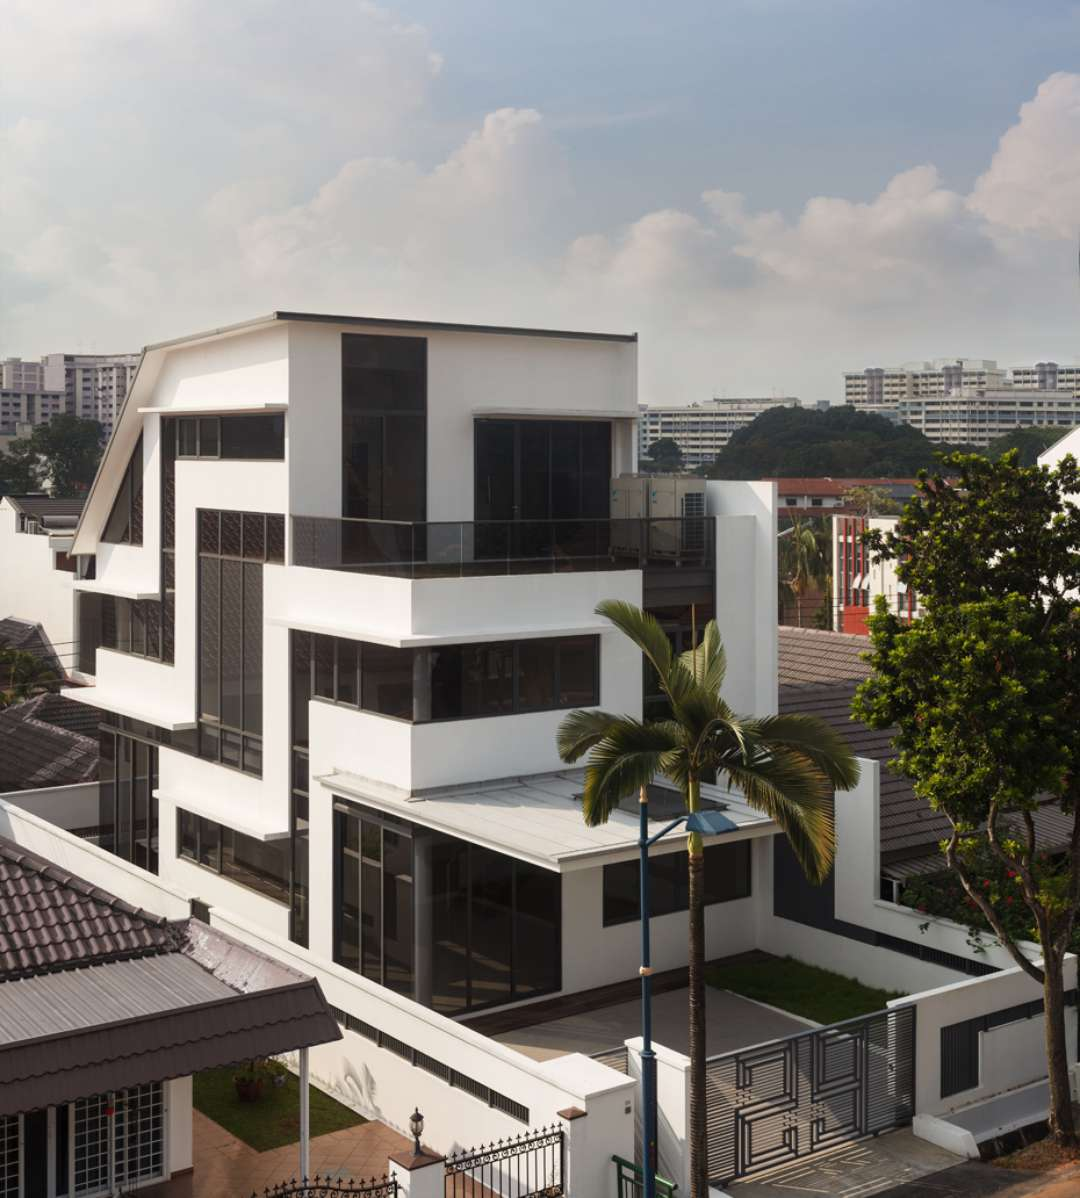 Pola Desain Arsitektur: NGARSITEKTUR TUR: 5 Bangunan Modern Yang Mengacu Pada 5